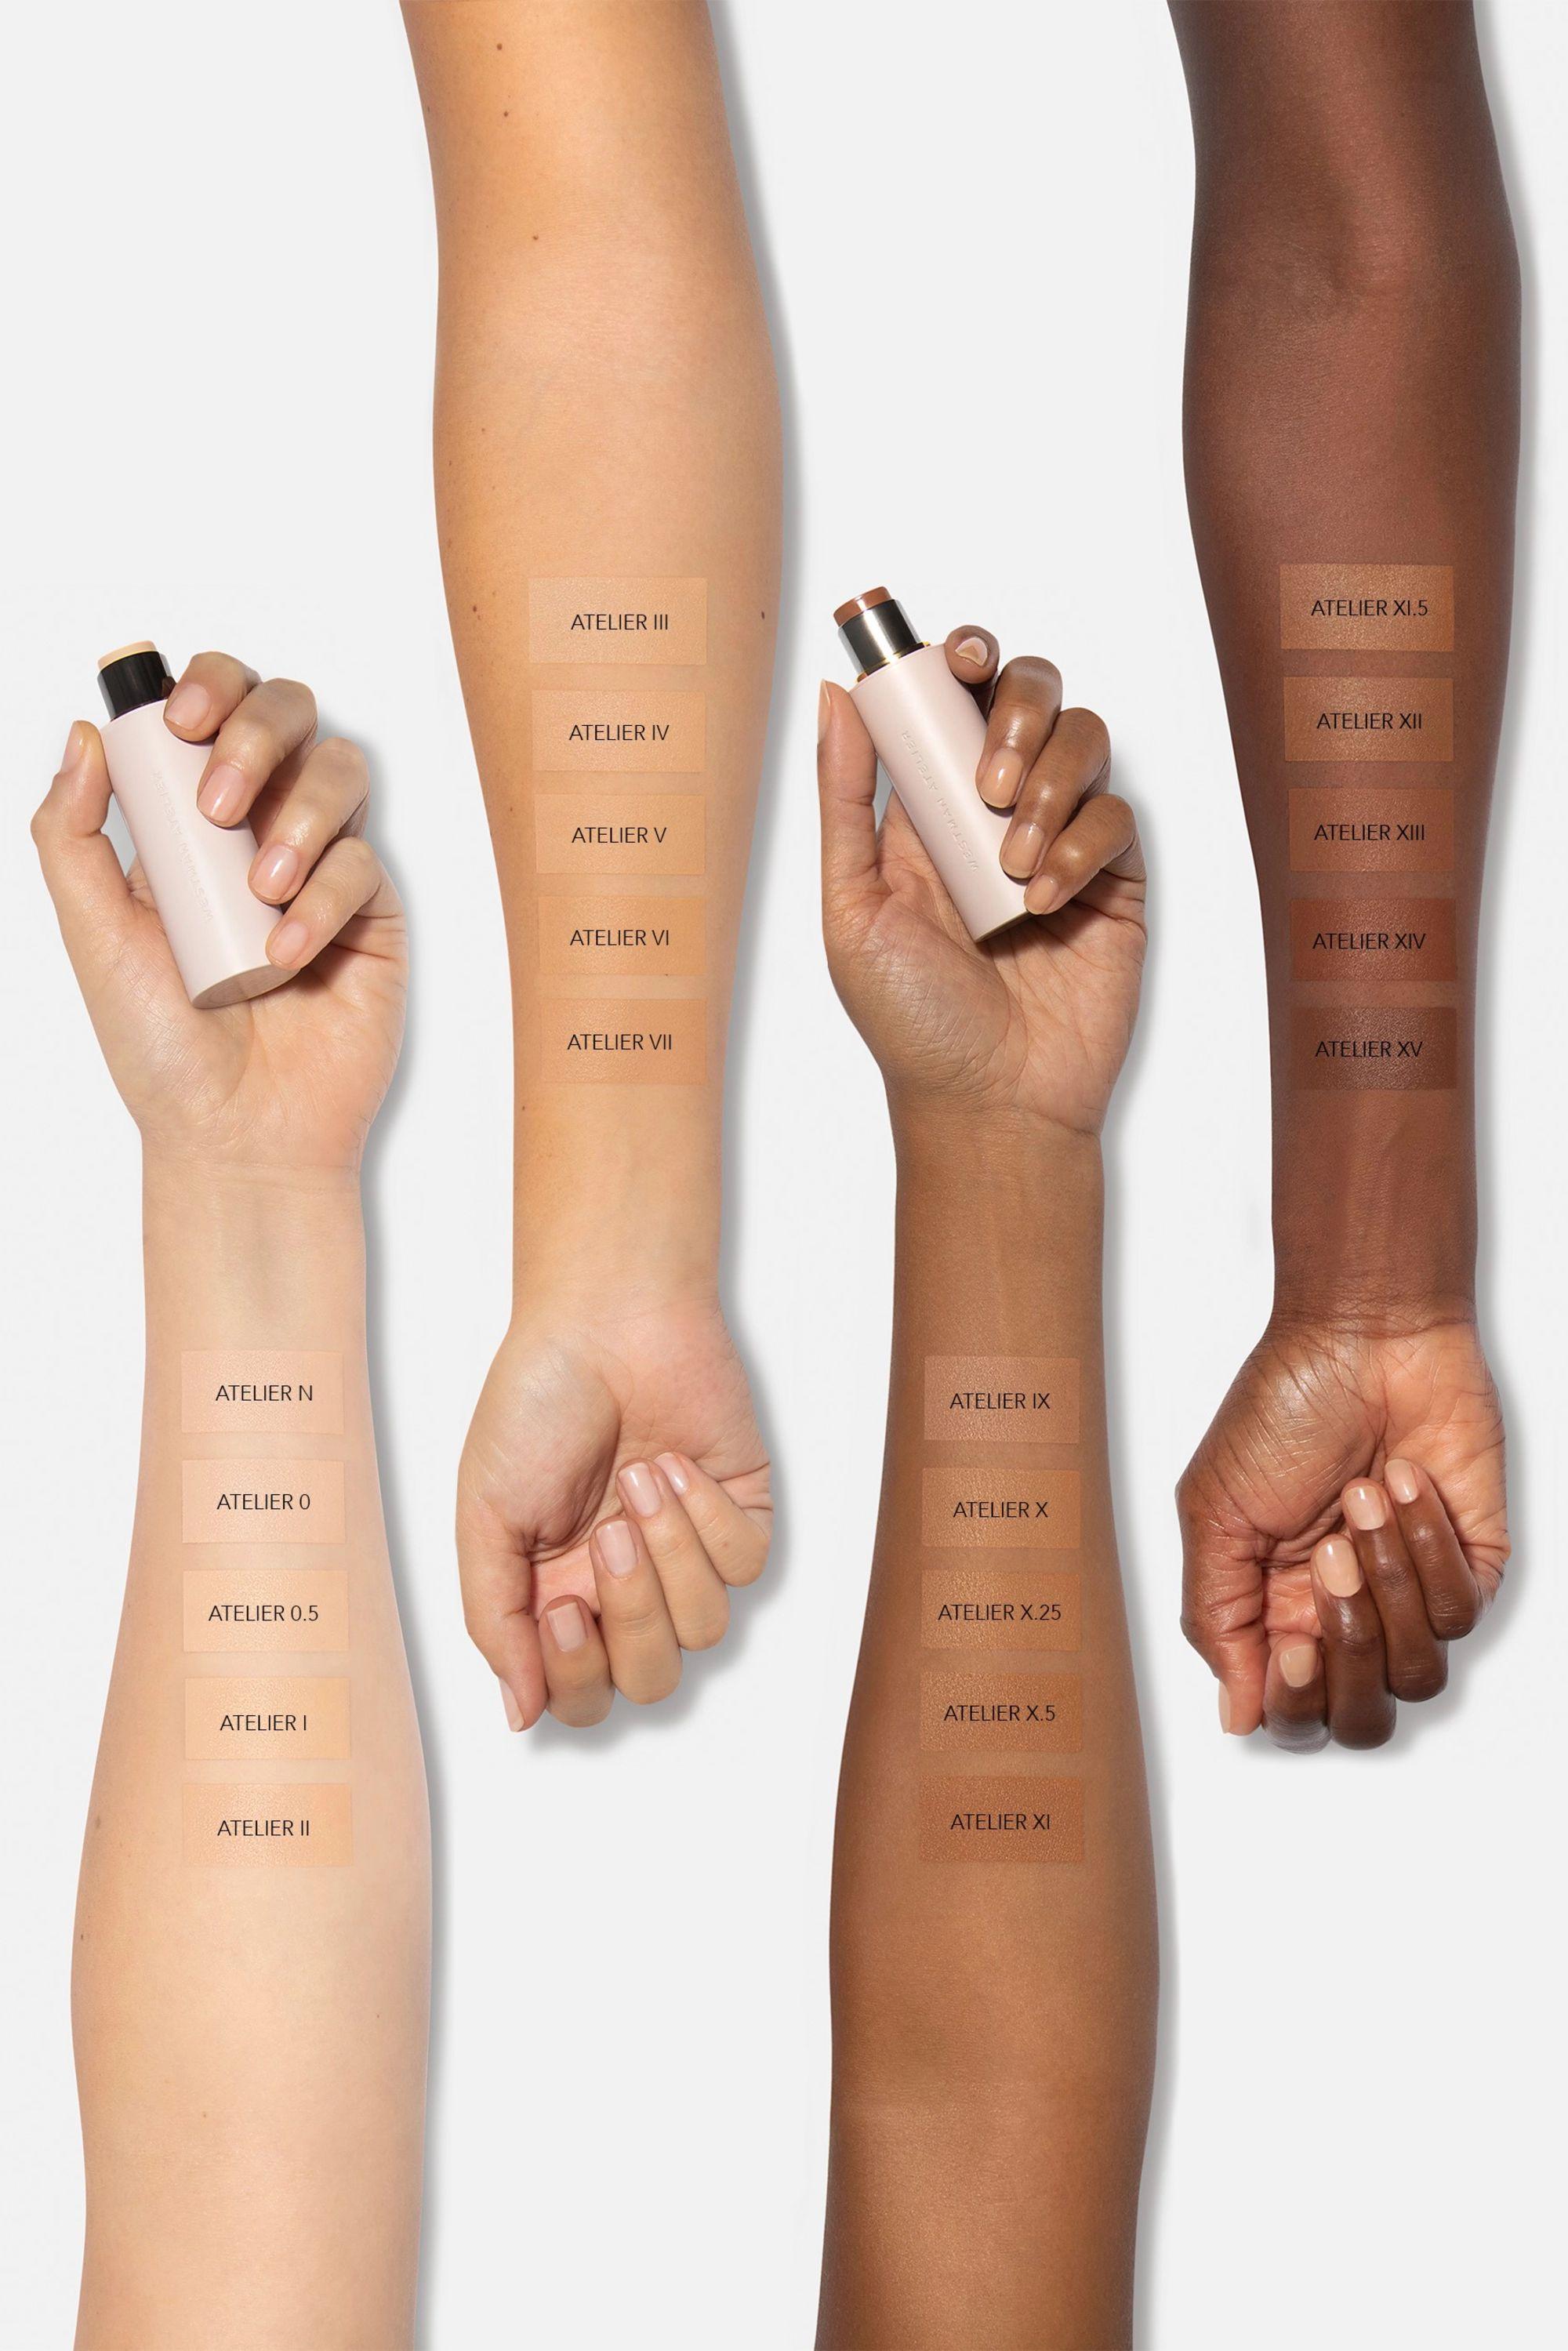 Westman Atelier Vital Skin Foundation Stick - Atelier VII, 9g